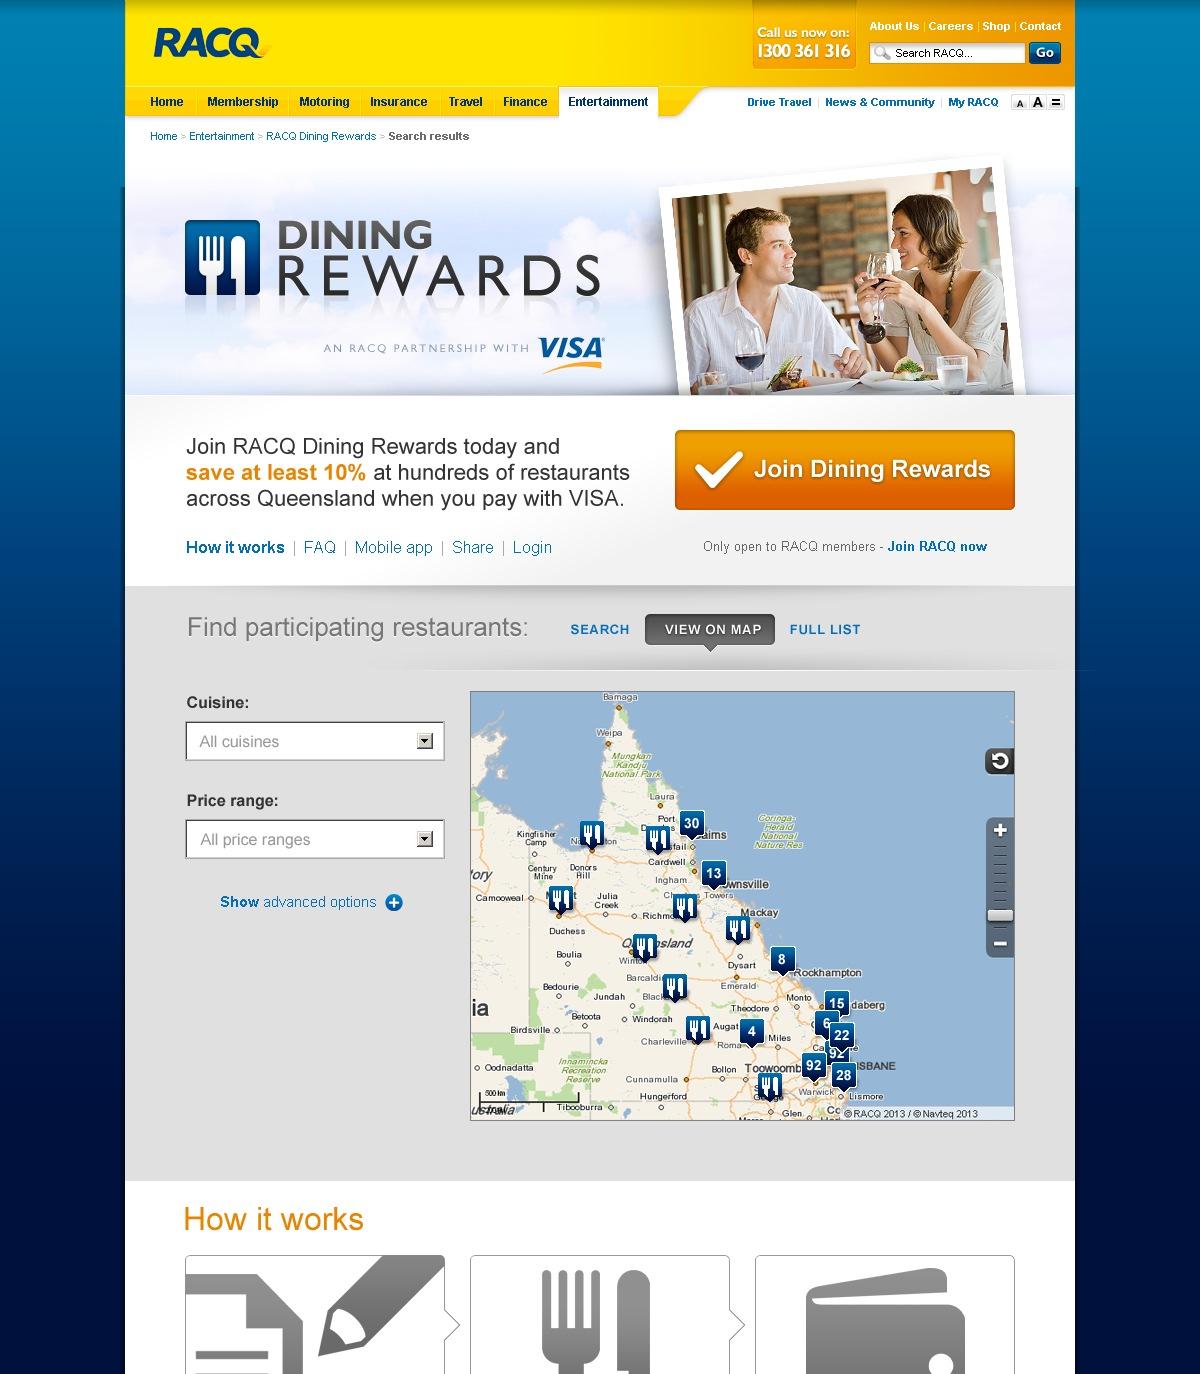 2013-03-Dining-rewards-landing-search-v10_0006_View-on-map.jpg